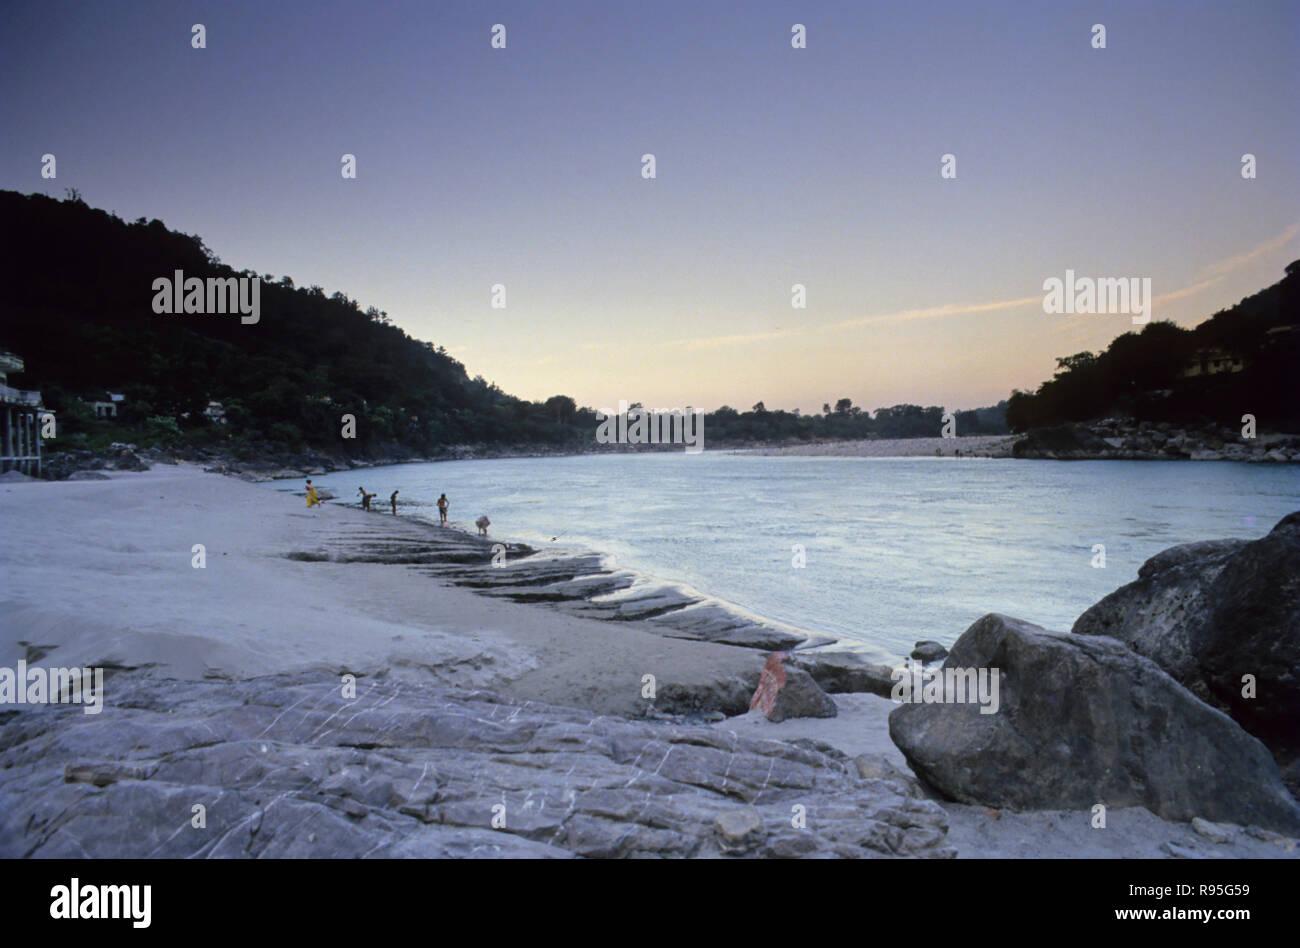 Vue de la rivière ganga, Rishikesh, Uttaranchal, Inde Banque D'Images